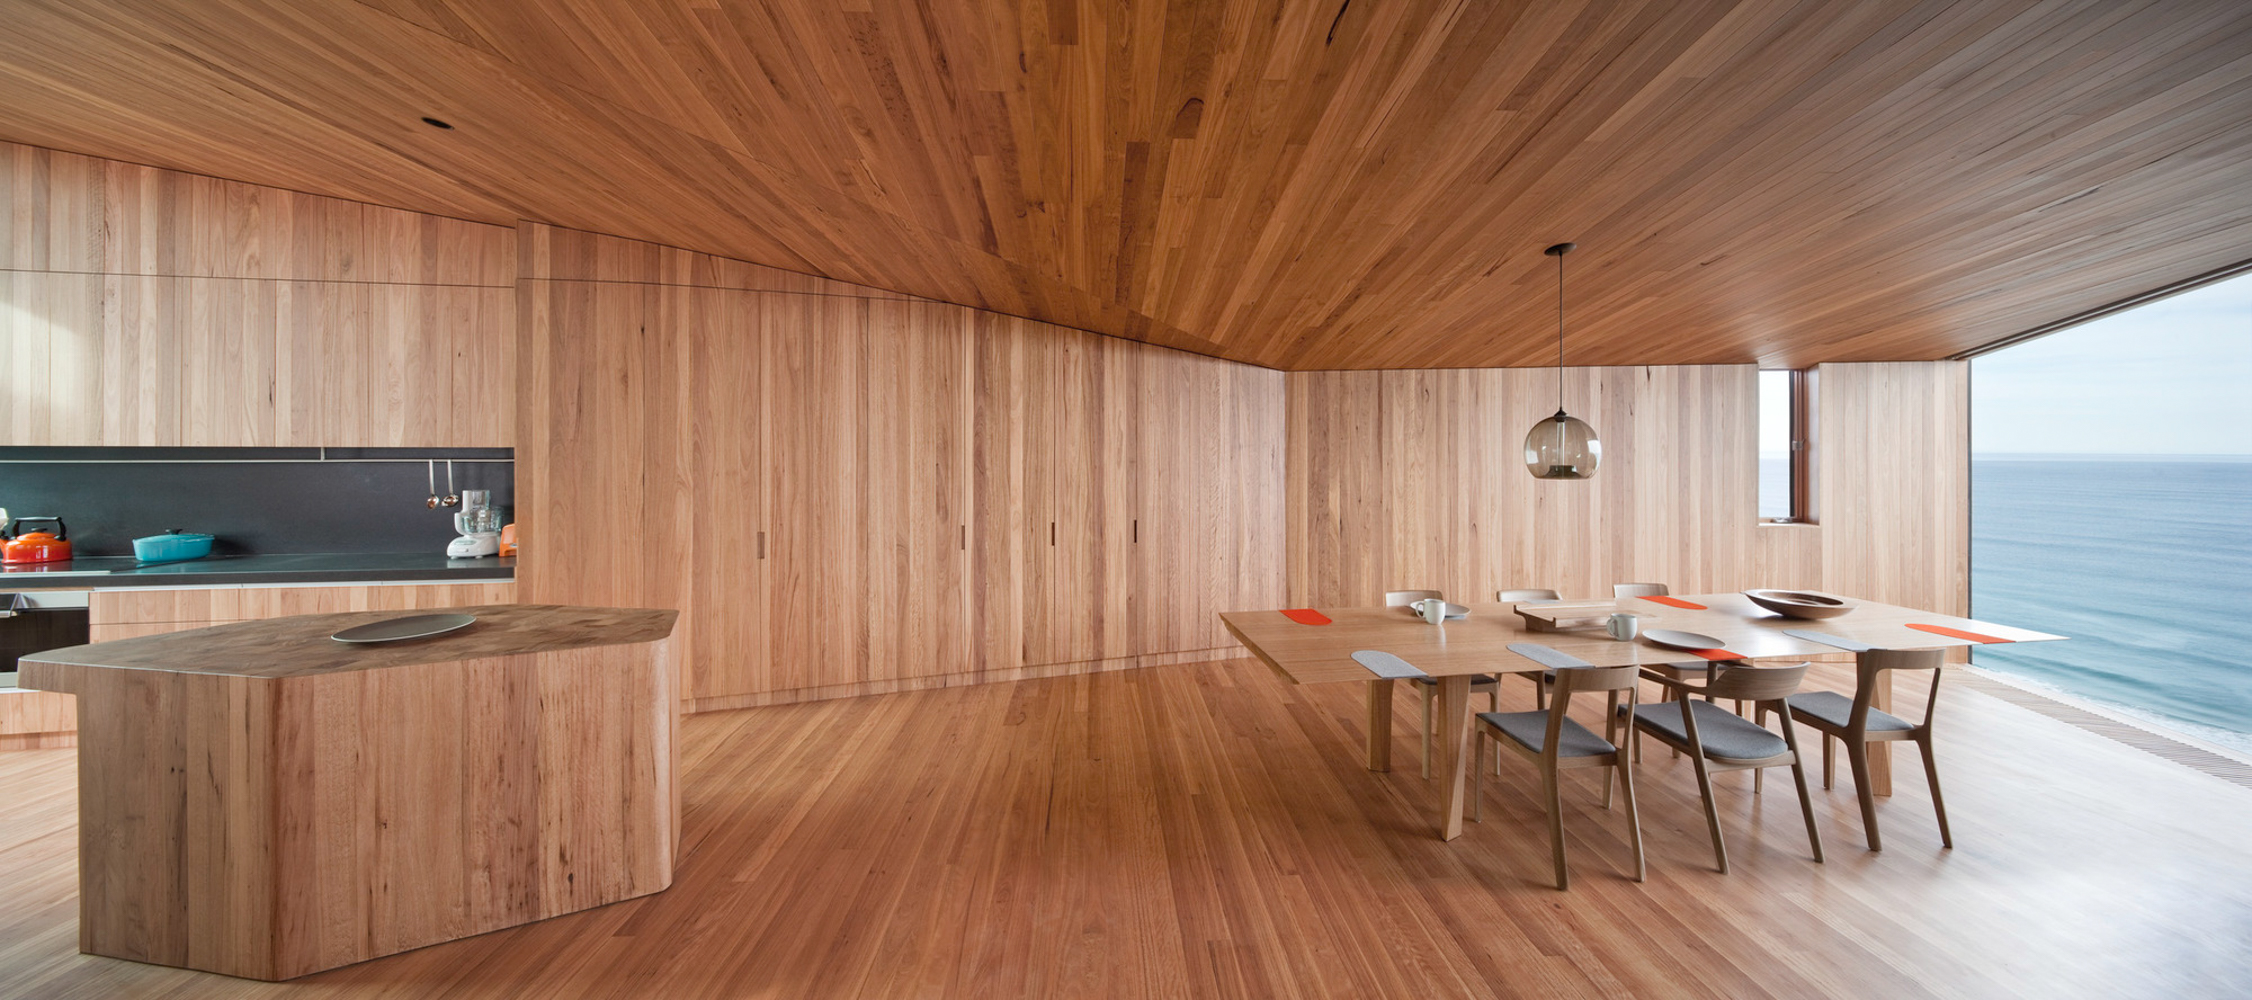 fairhaven-beach-house-john-wardle-architects-the-design-emotive-07.jpg